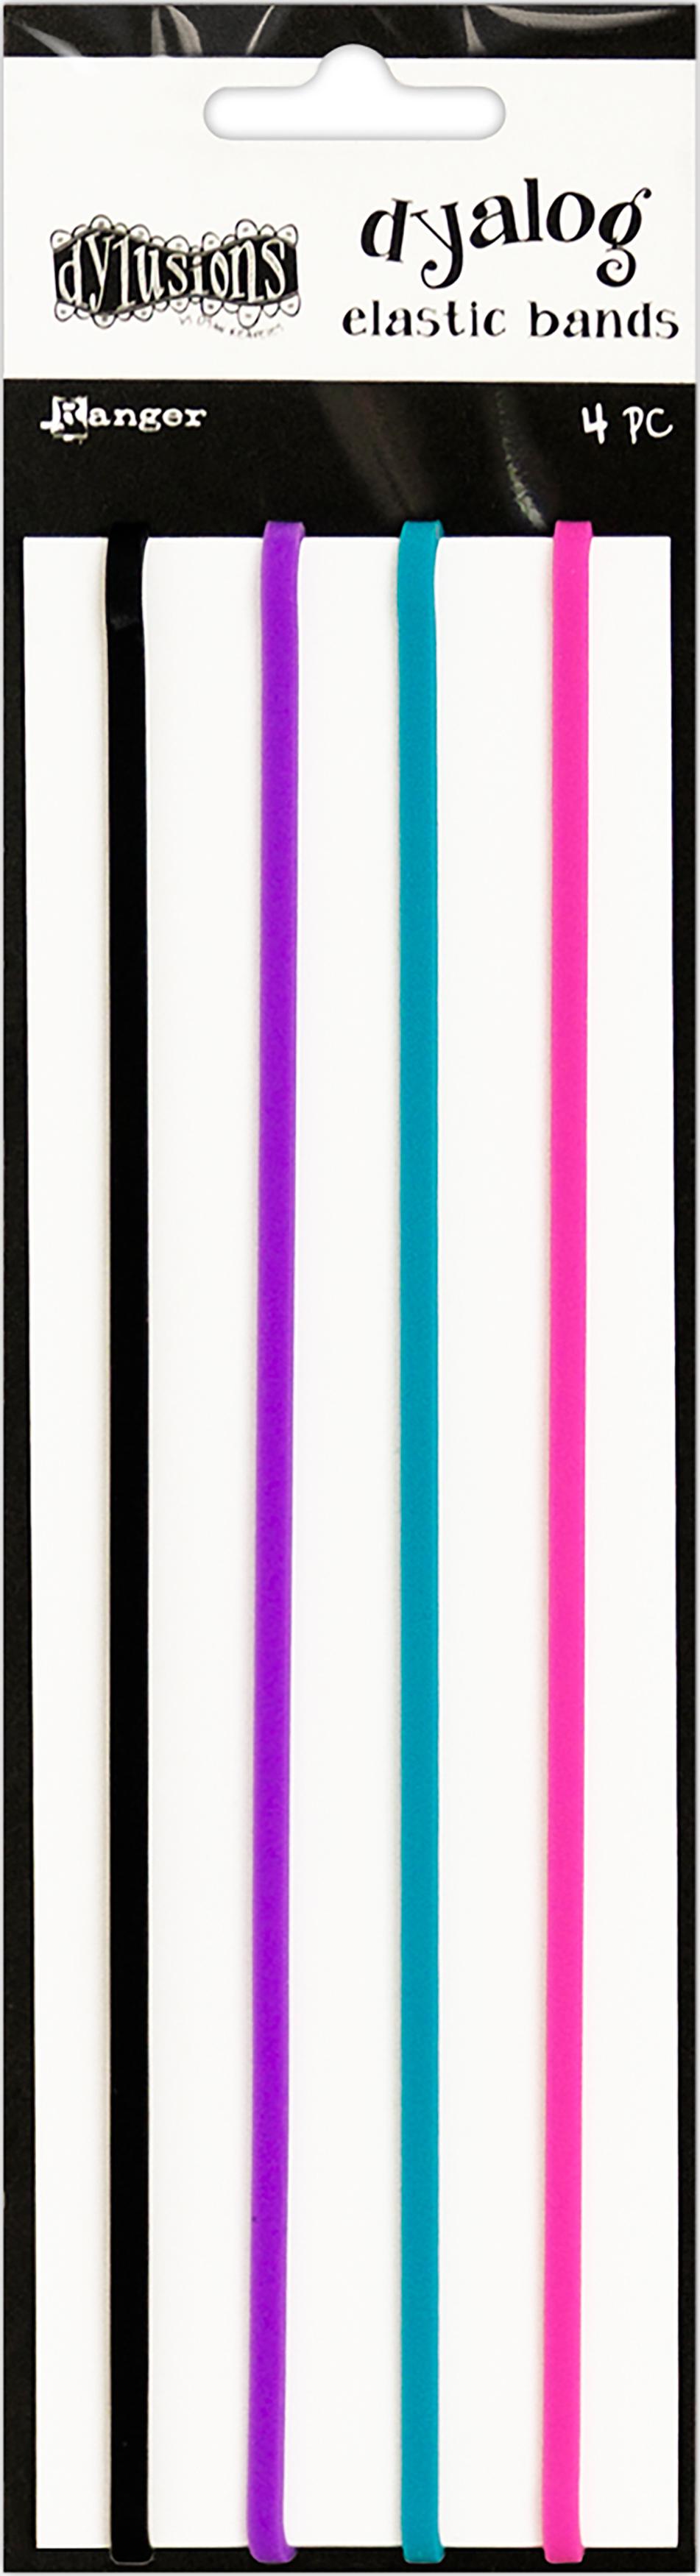 Dyan Reaveley's Dylusions Dyalog Notebook Elastic Bands 4/Pk-